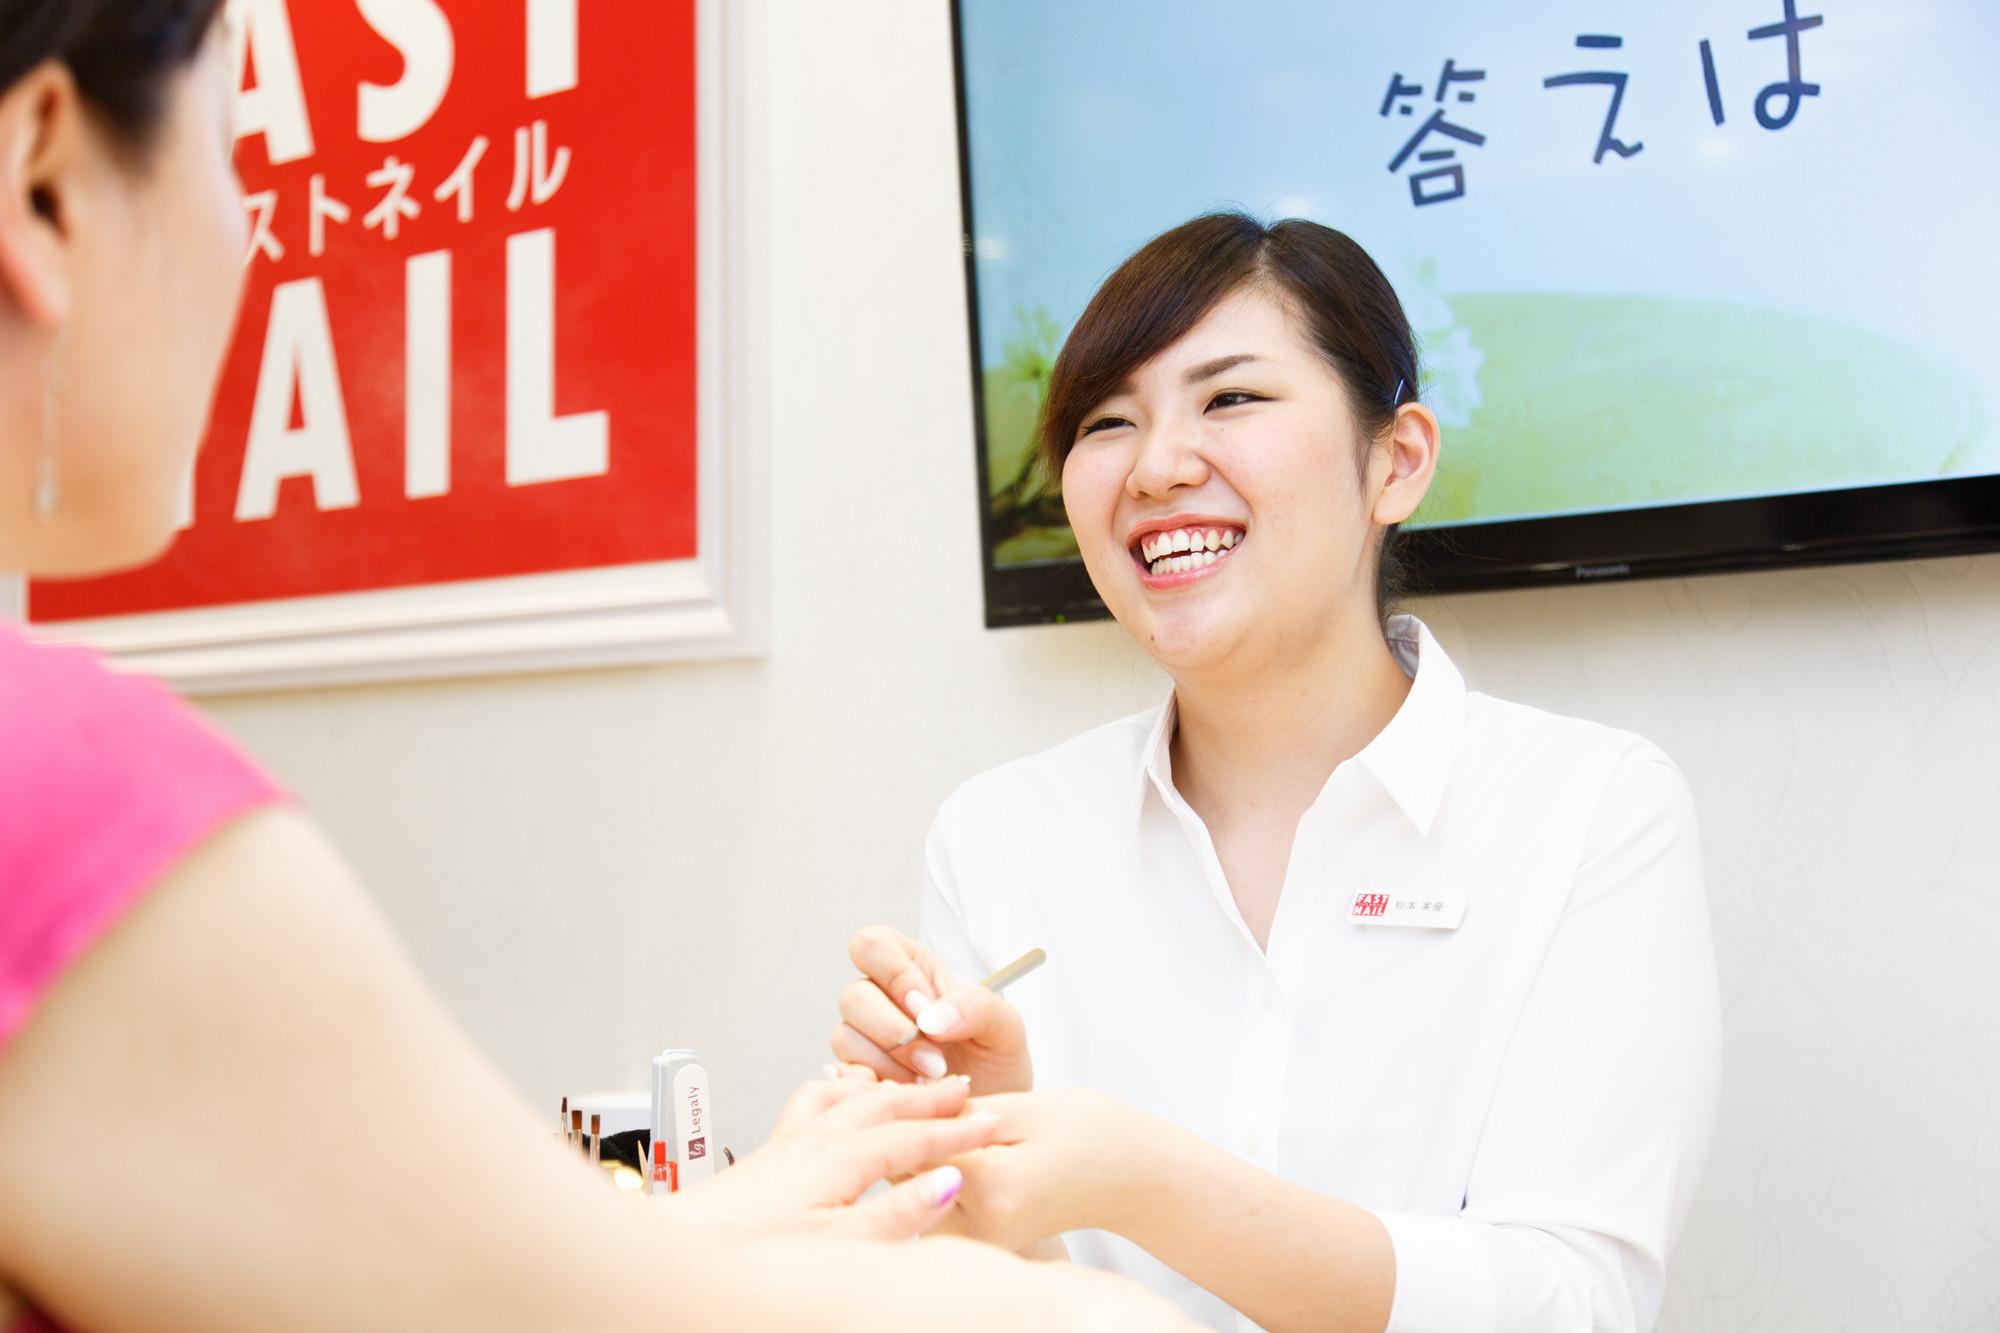 FASTNAIL(ファストネイル) 高田馬場店 のアルバイト情報